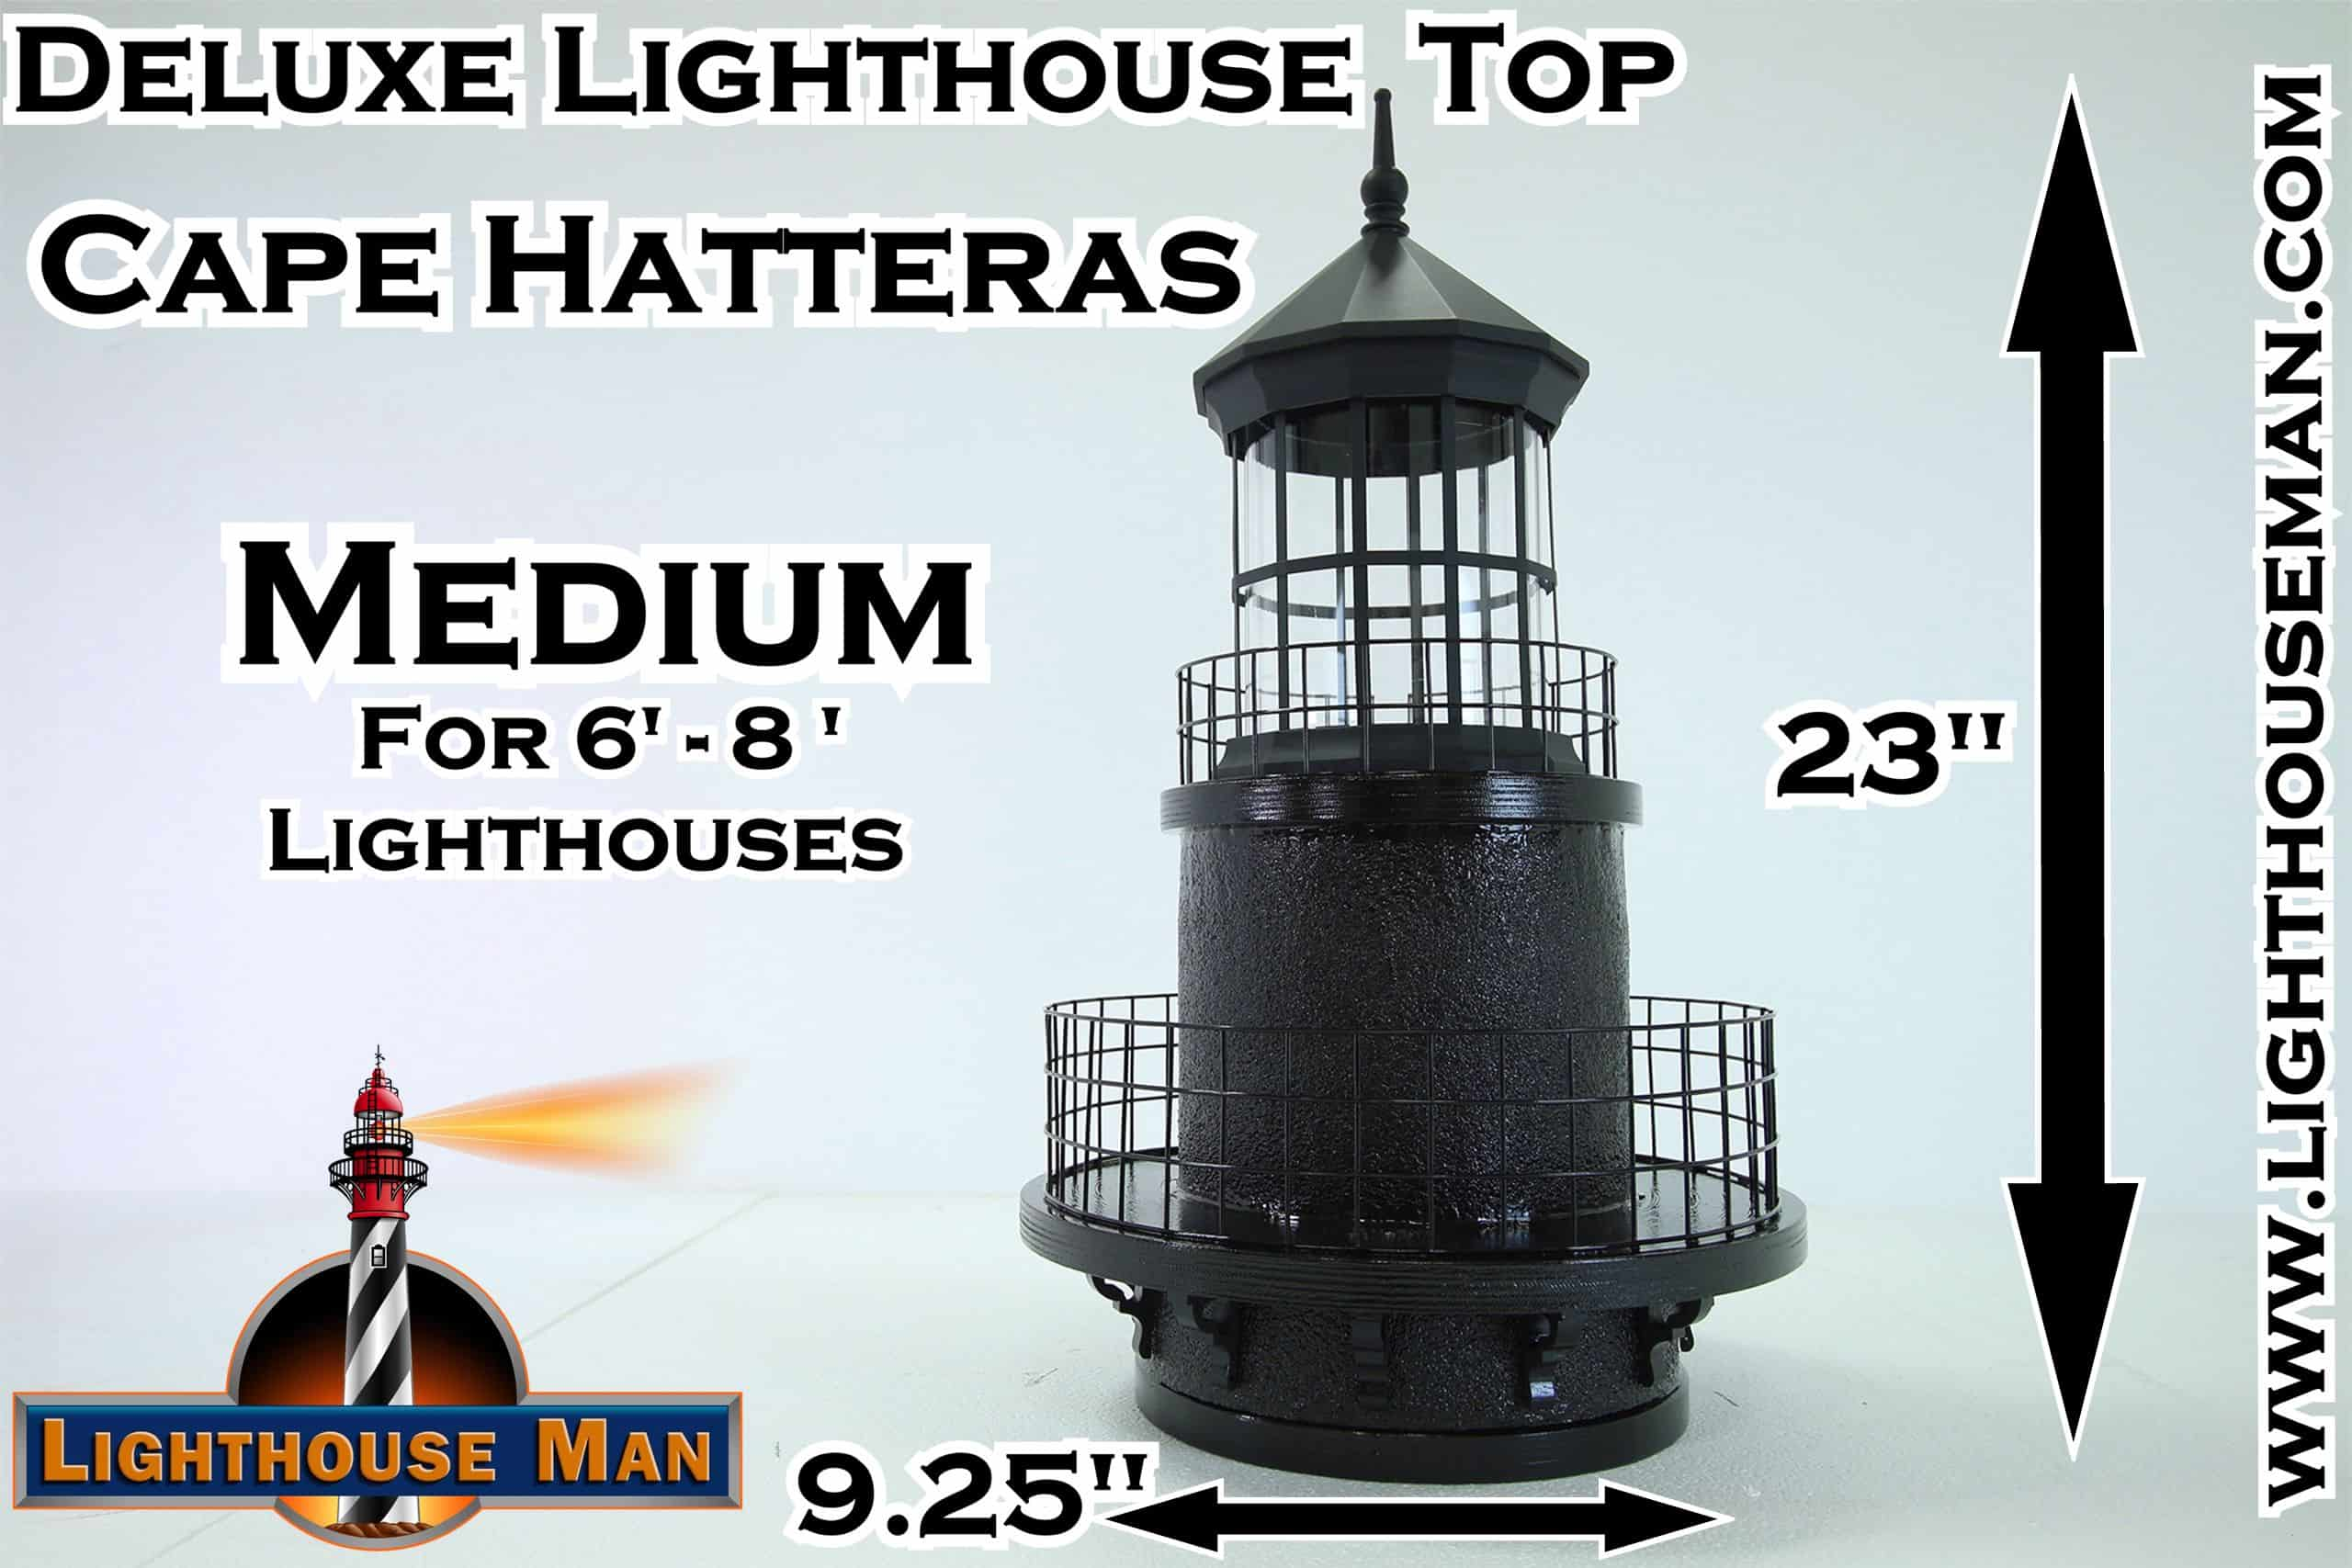 Deluxe Medium Cape Hatteras Lighthouse Top